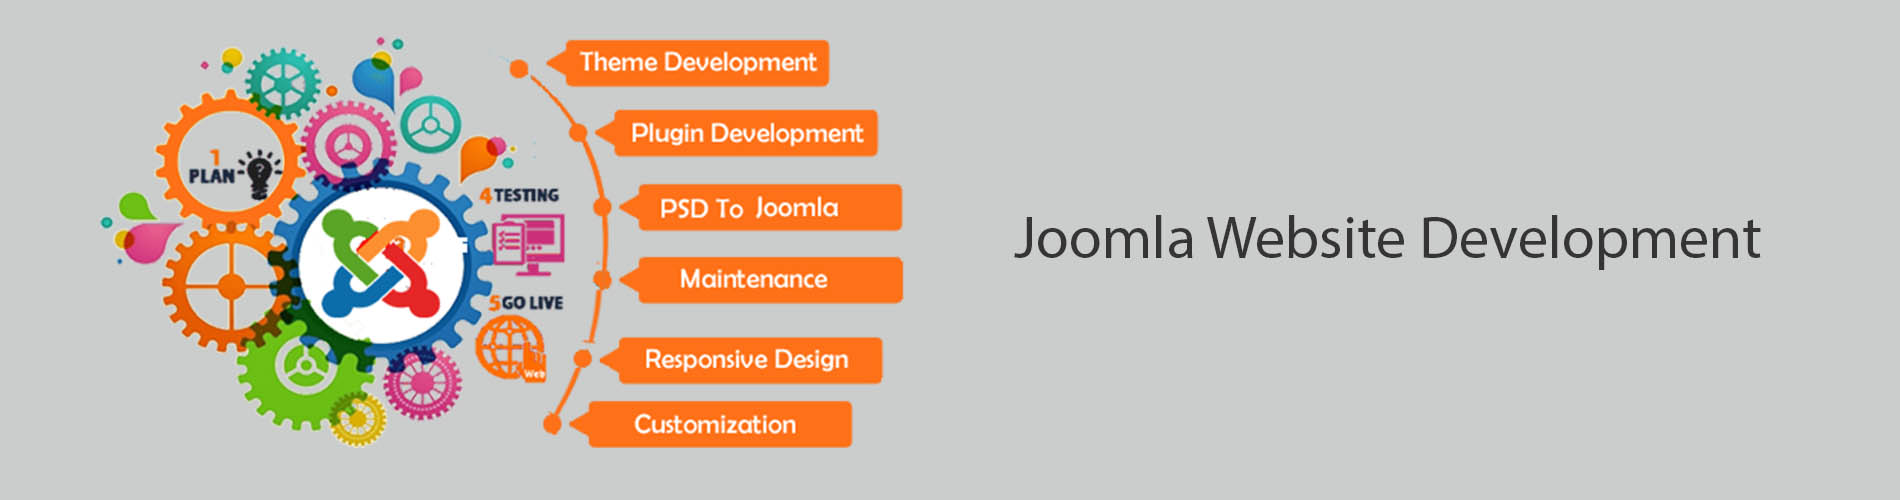 joomla-web-development-company